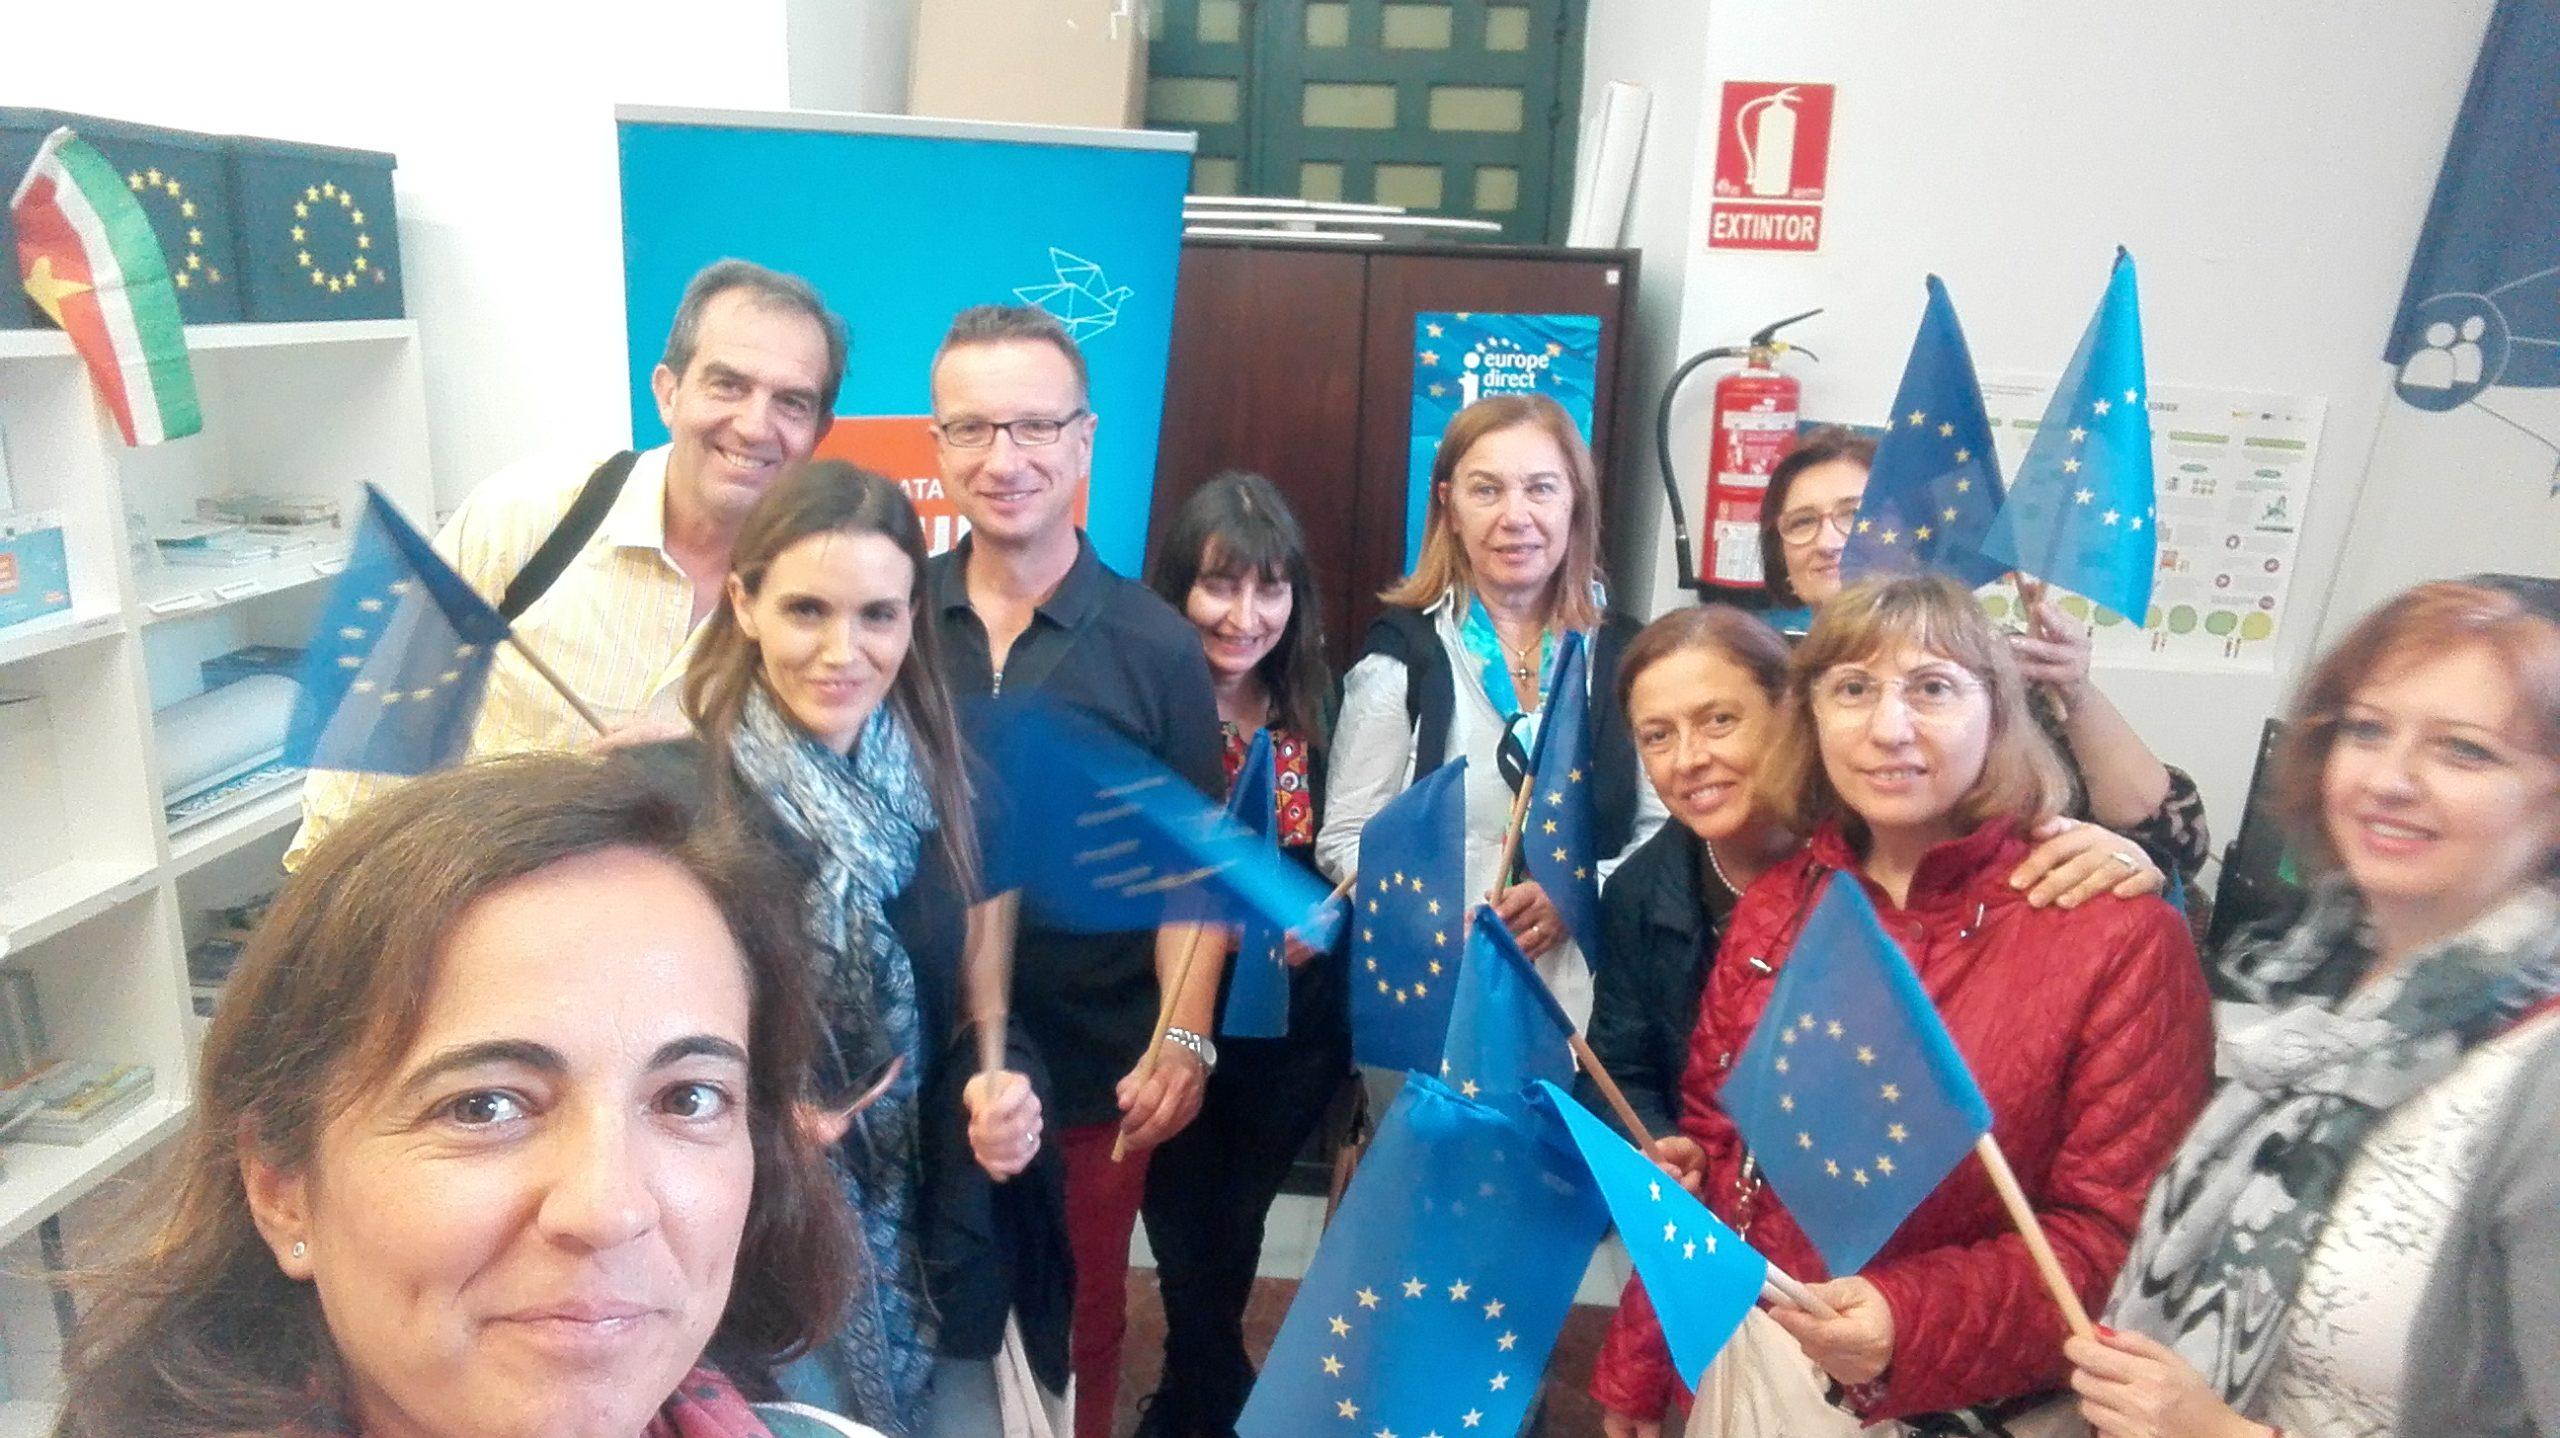 Visita al Centro Europe Direct profesores intermabio Erasmus + IES Gualdaquivir.